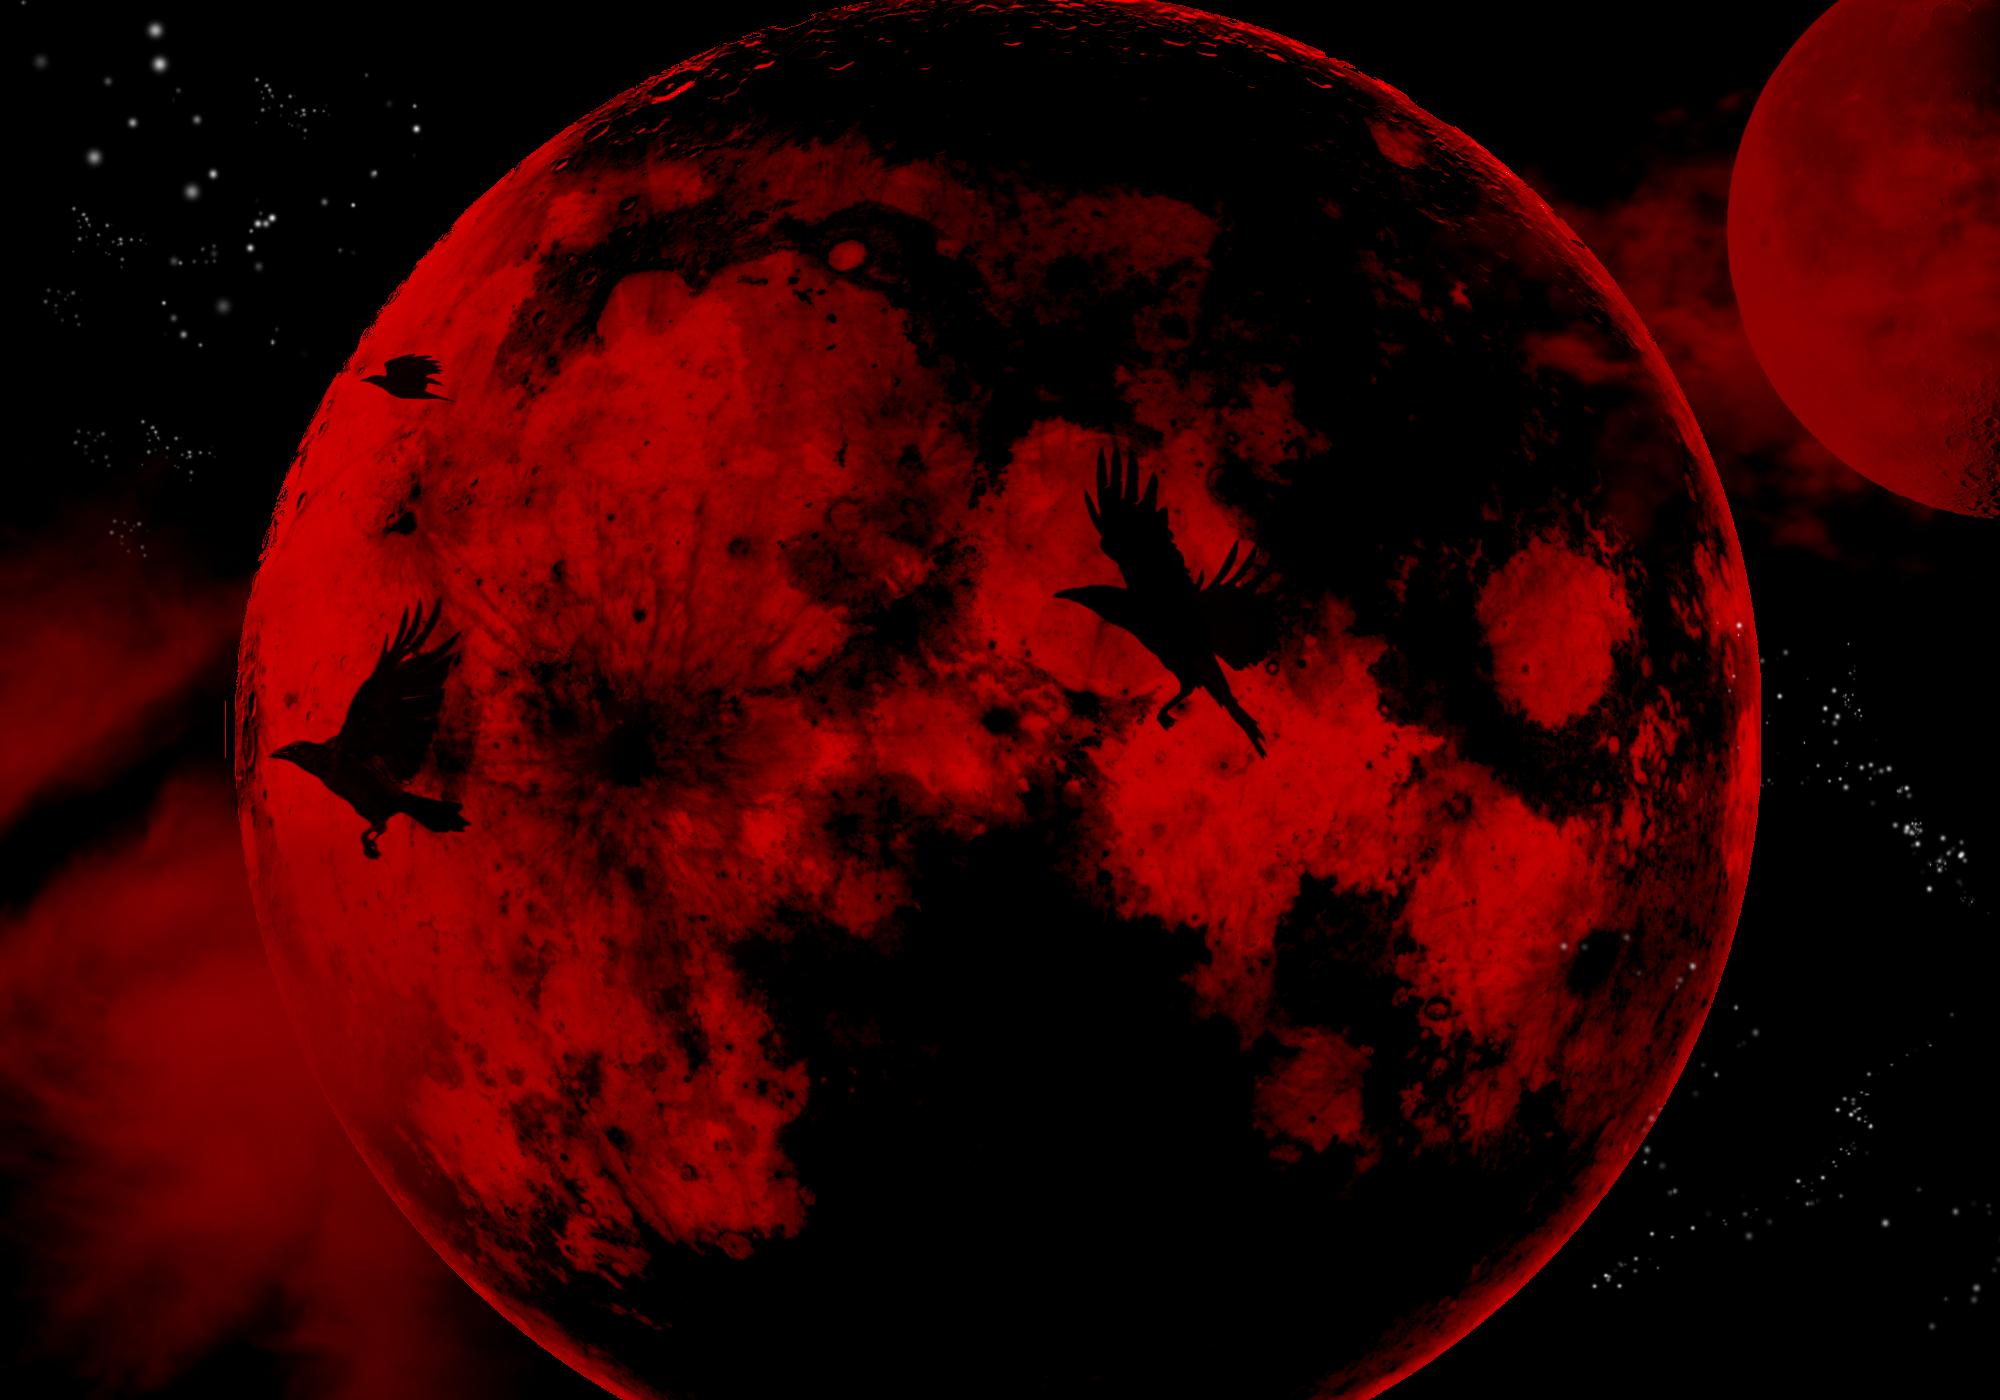 bloodmoon